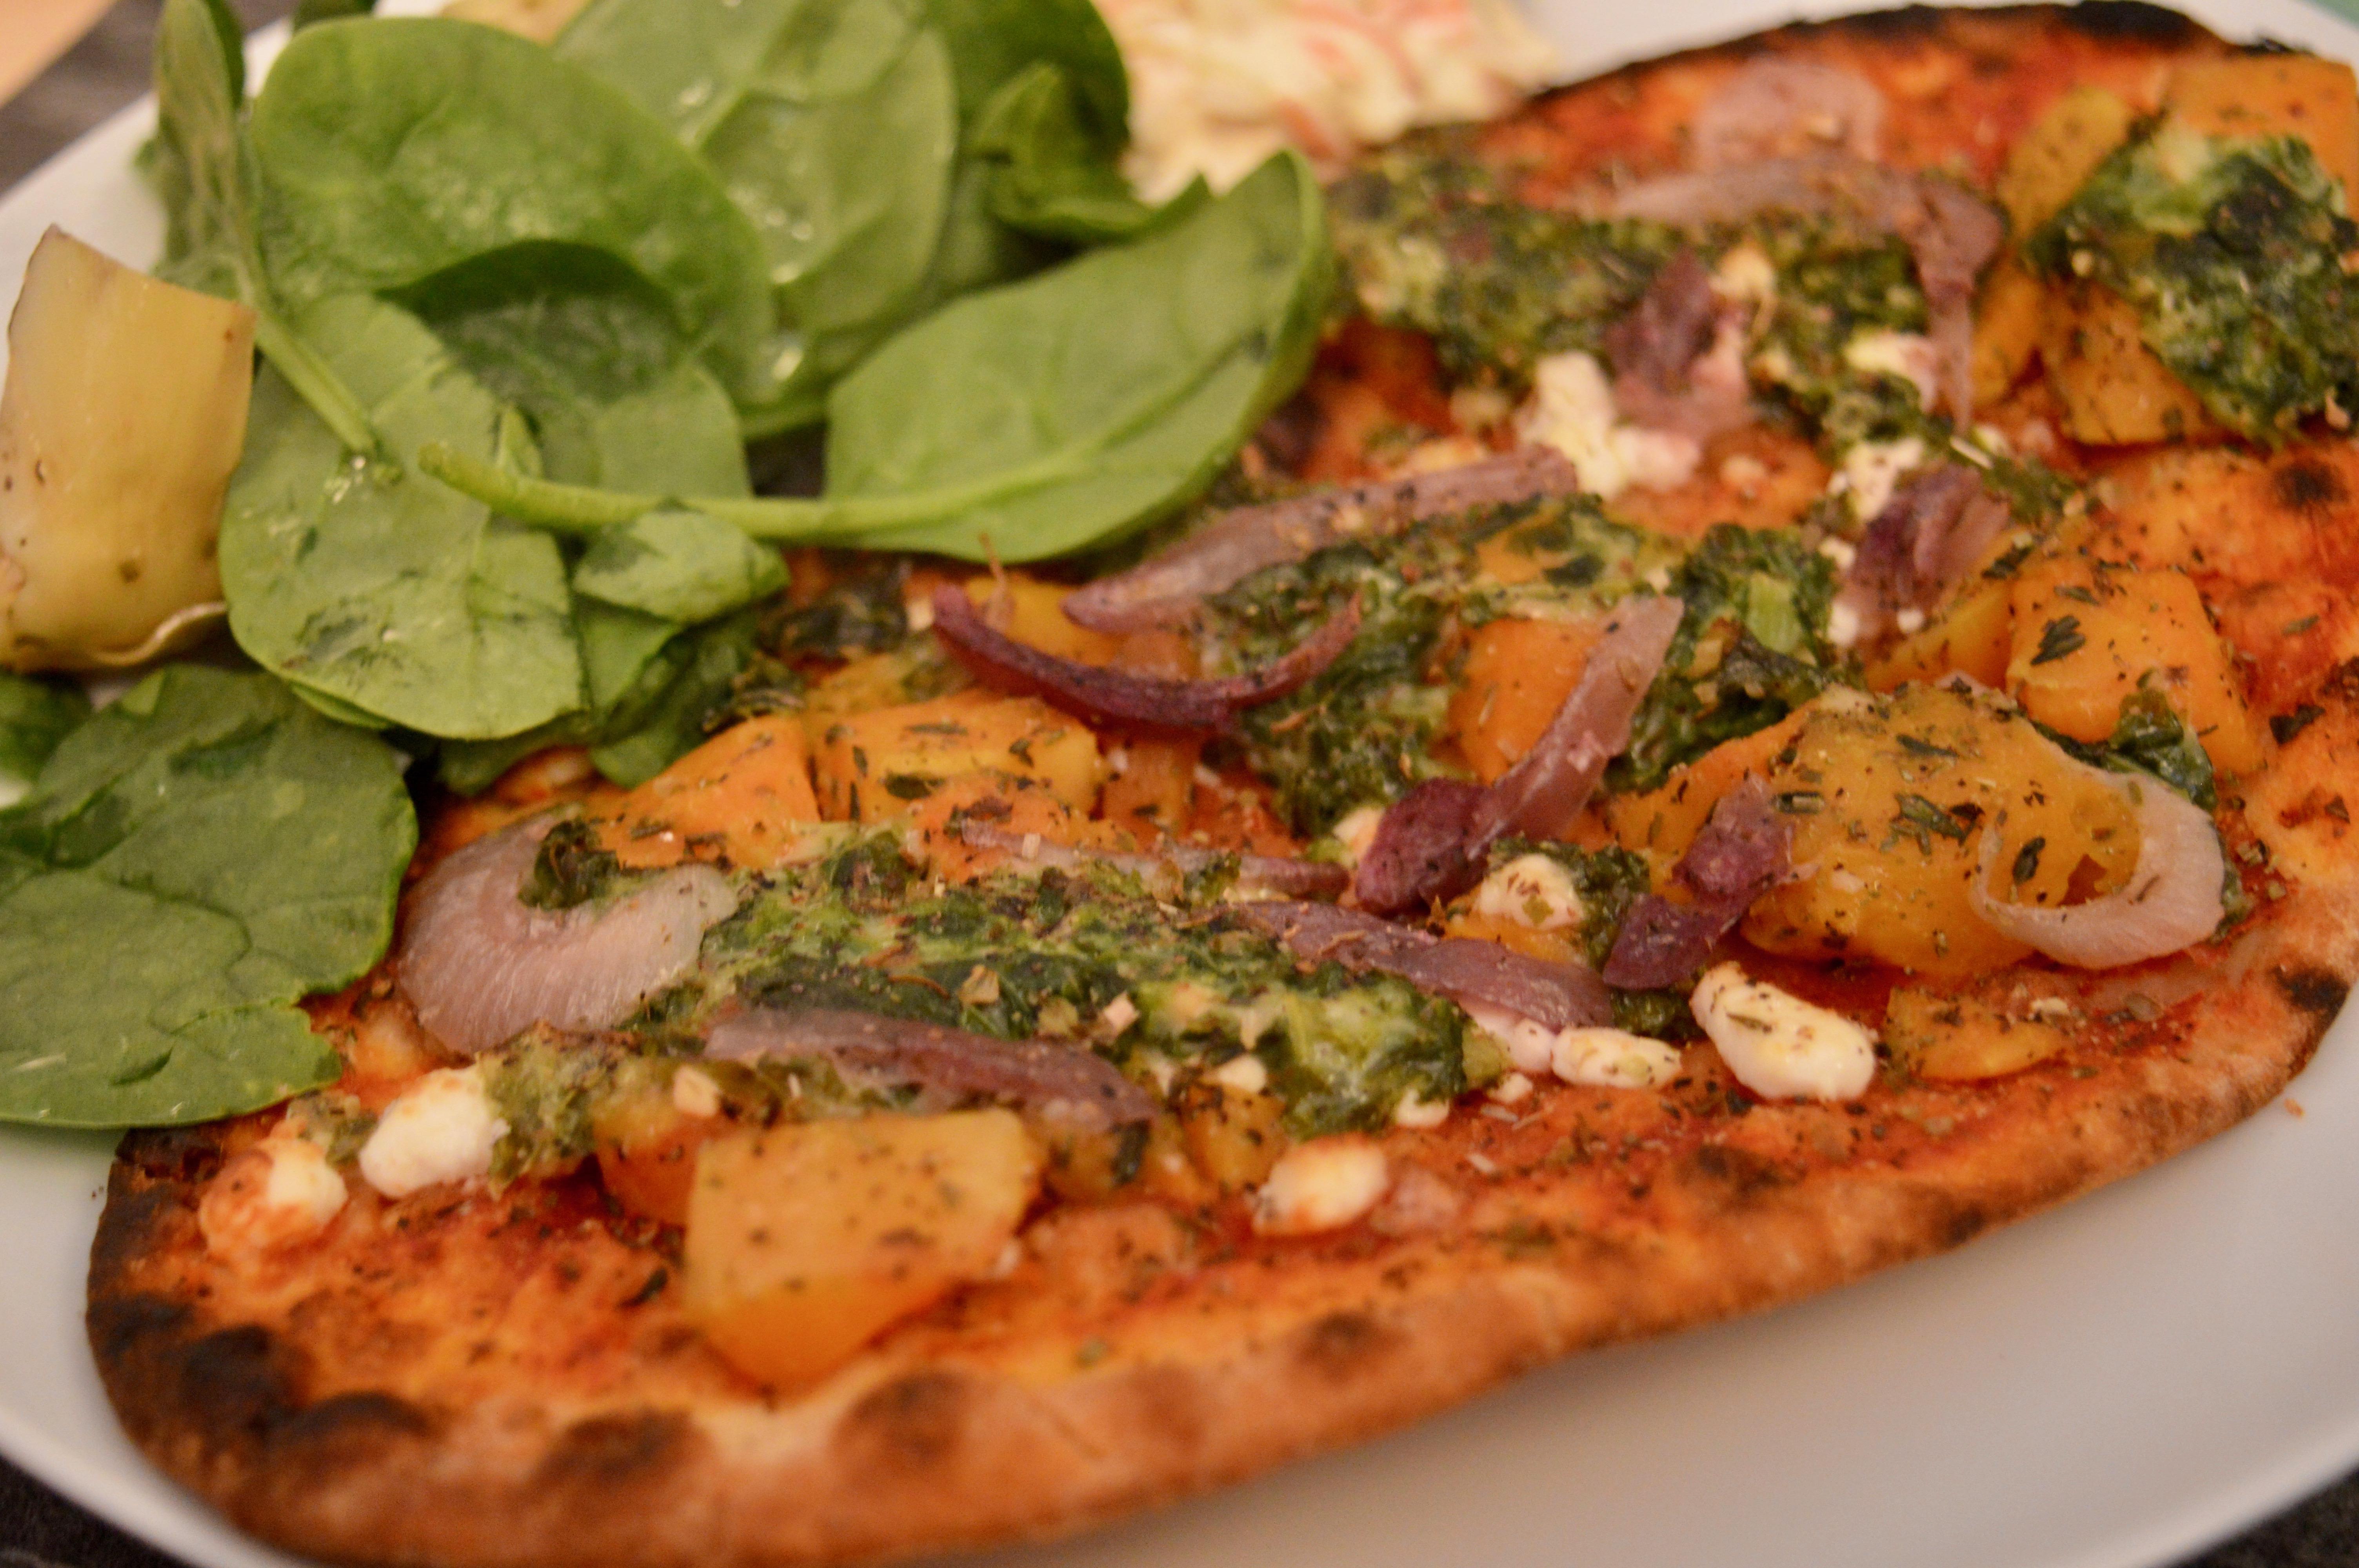 Pizza Express Leggera | Lighter Pizza Base | Healthy Choices | Elle Blonde Luxury Lifestyle Destination Blog